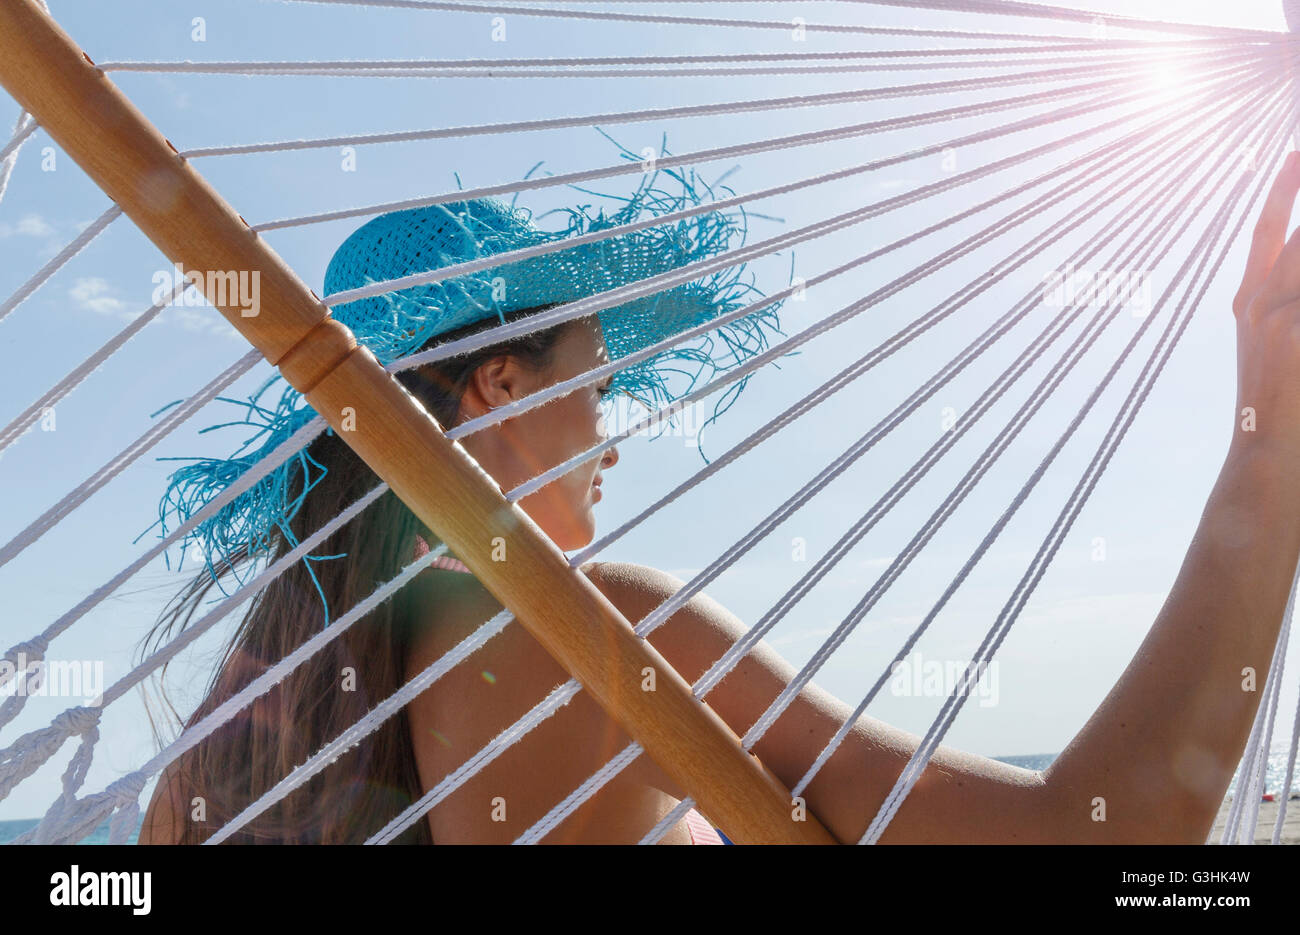 Rear view of young woman on hammock at Miami beach, Florida, USA - Stock Image